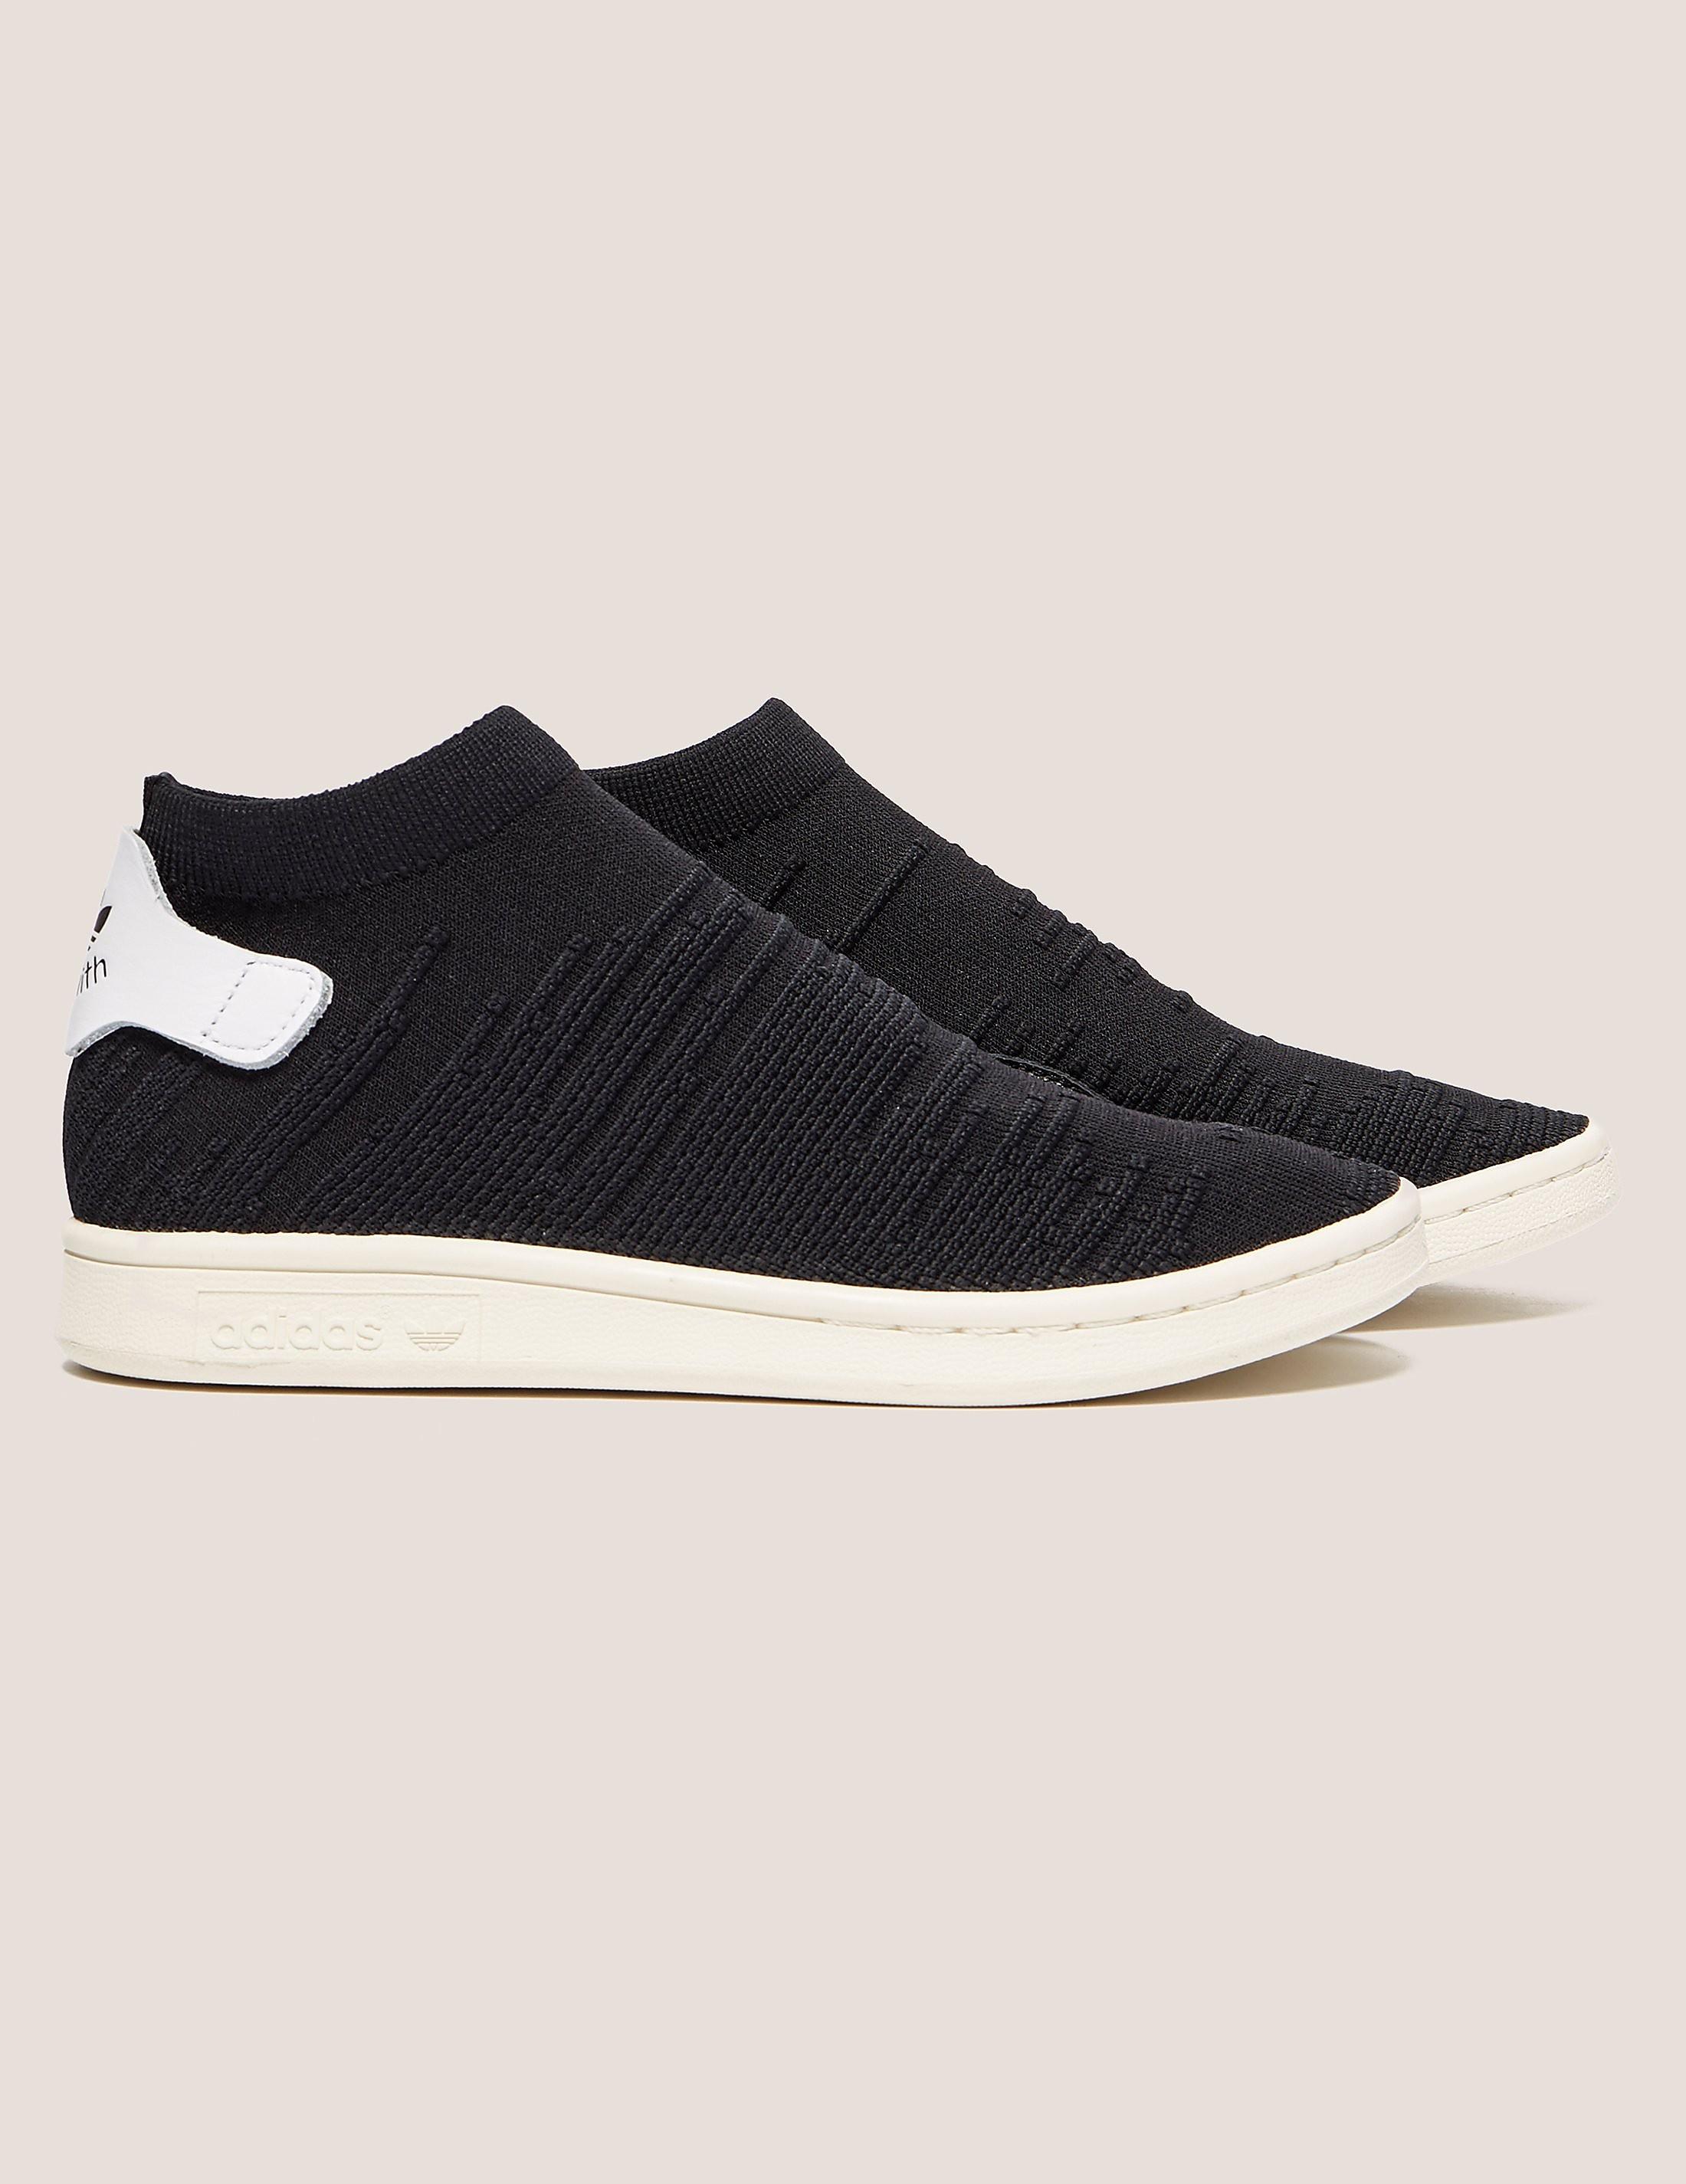 adidas Originals Stan Smith Sock Women's